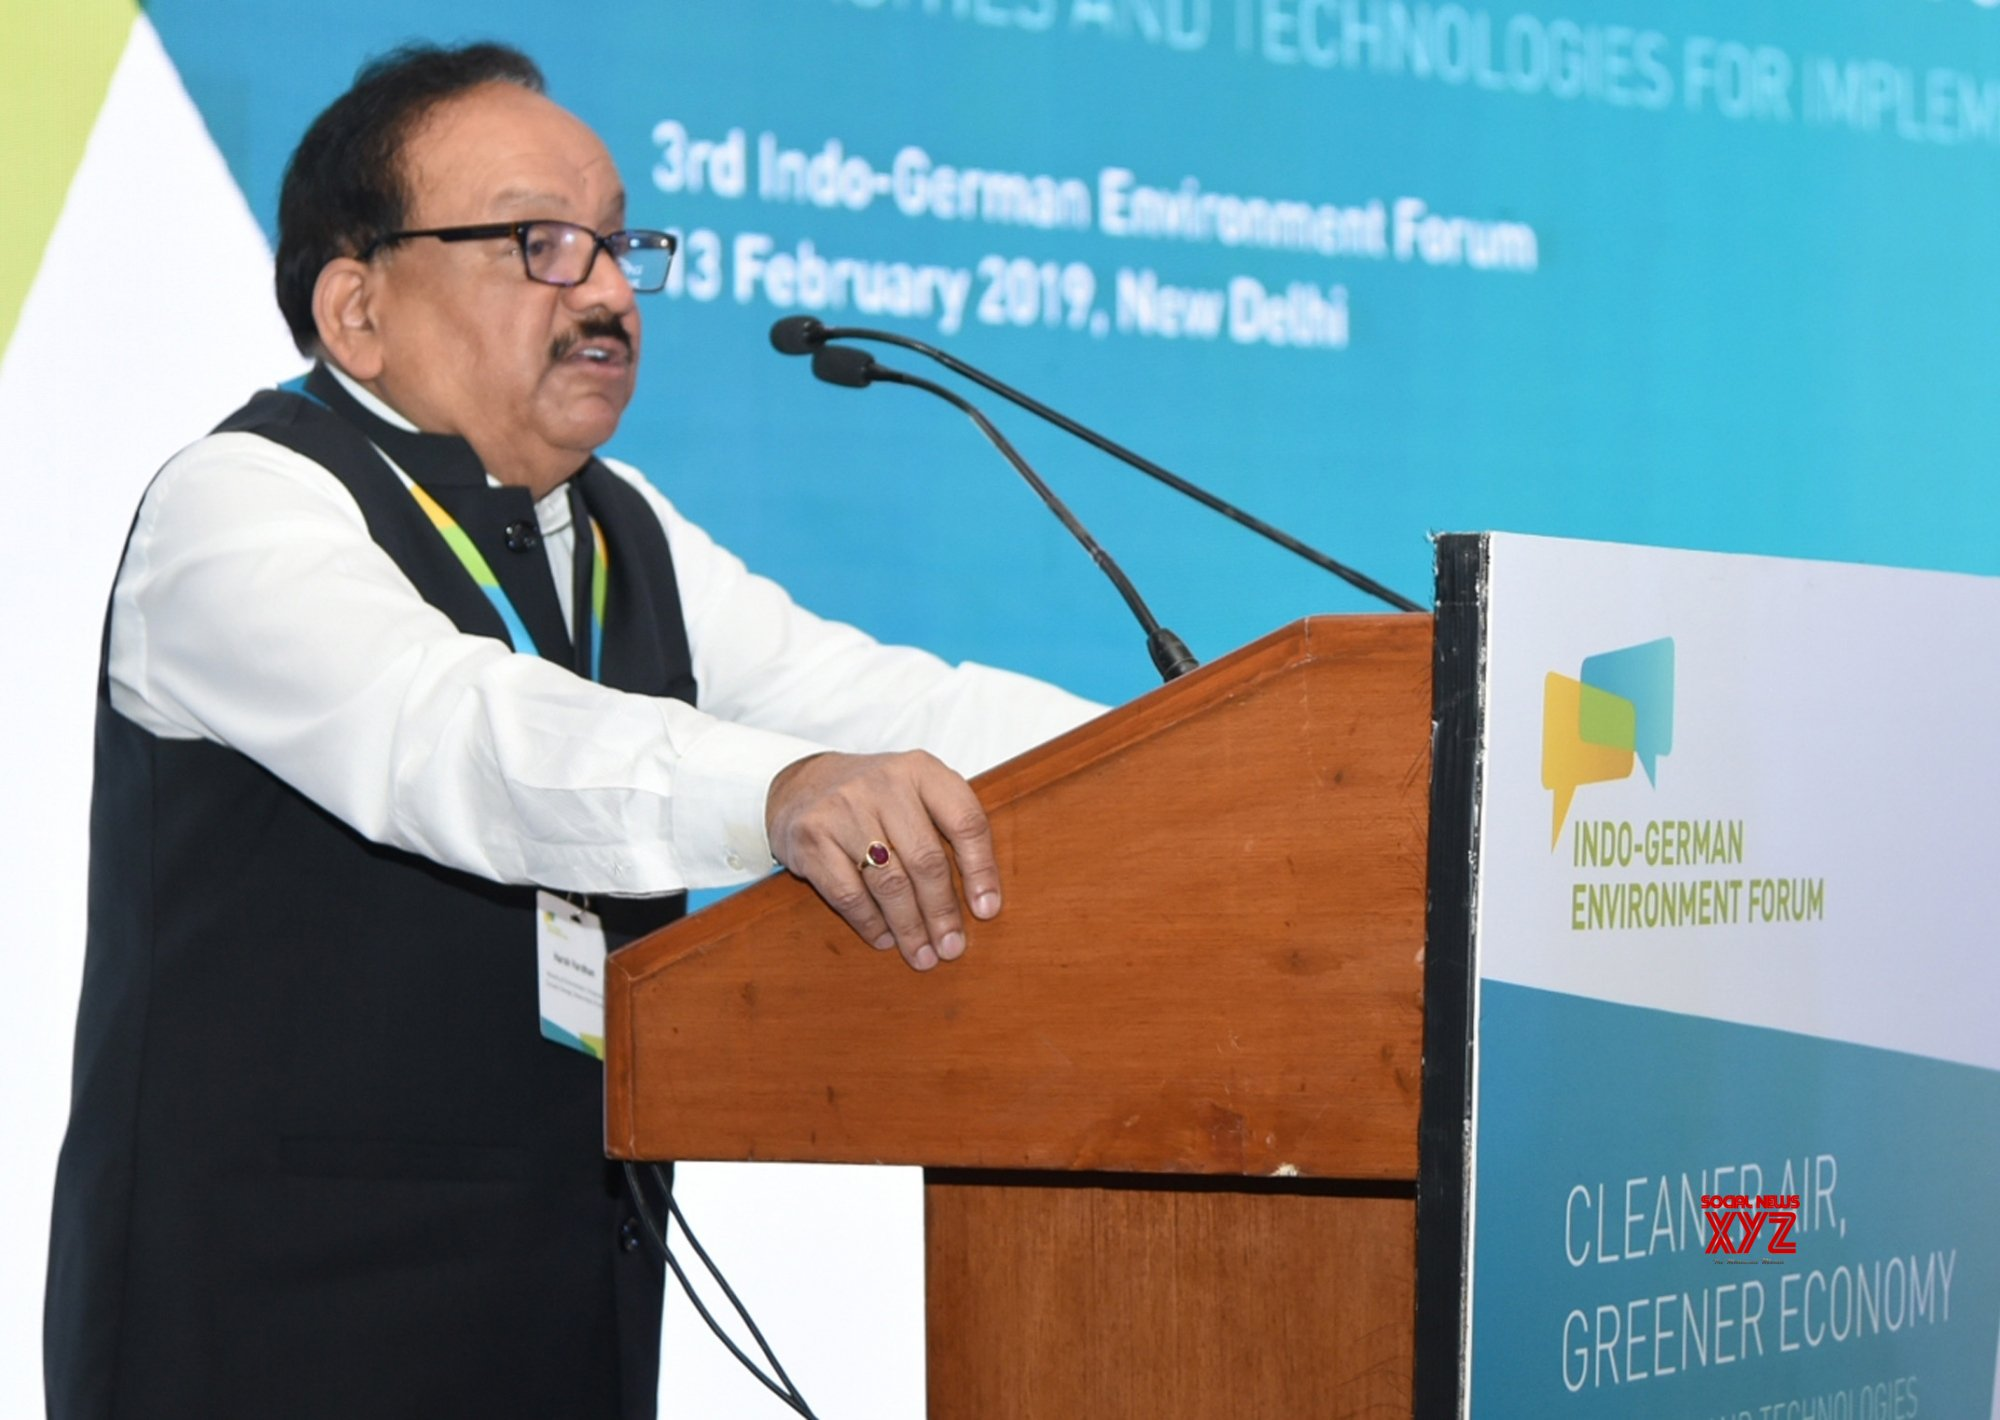 New Delhi: 3rd Indo - German Environment Forum - Harsh Vardhan #Gallery